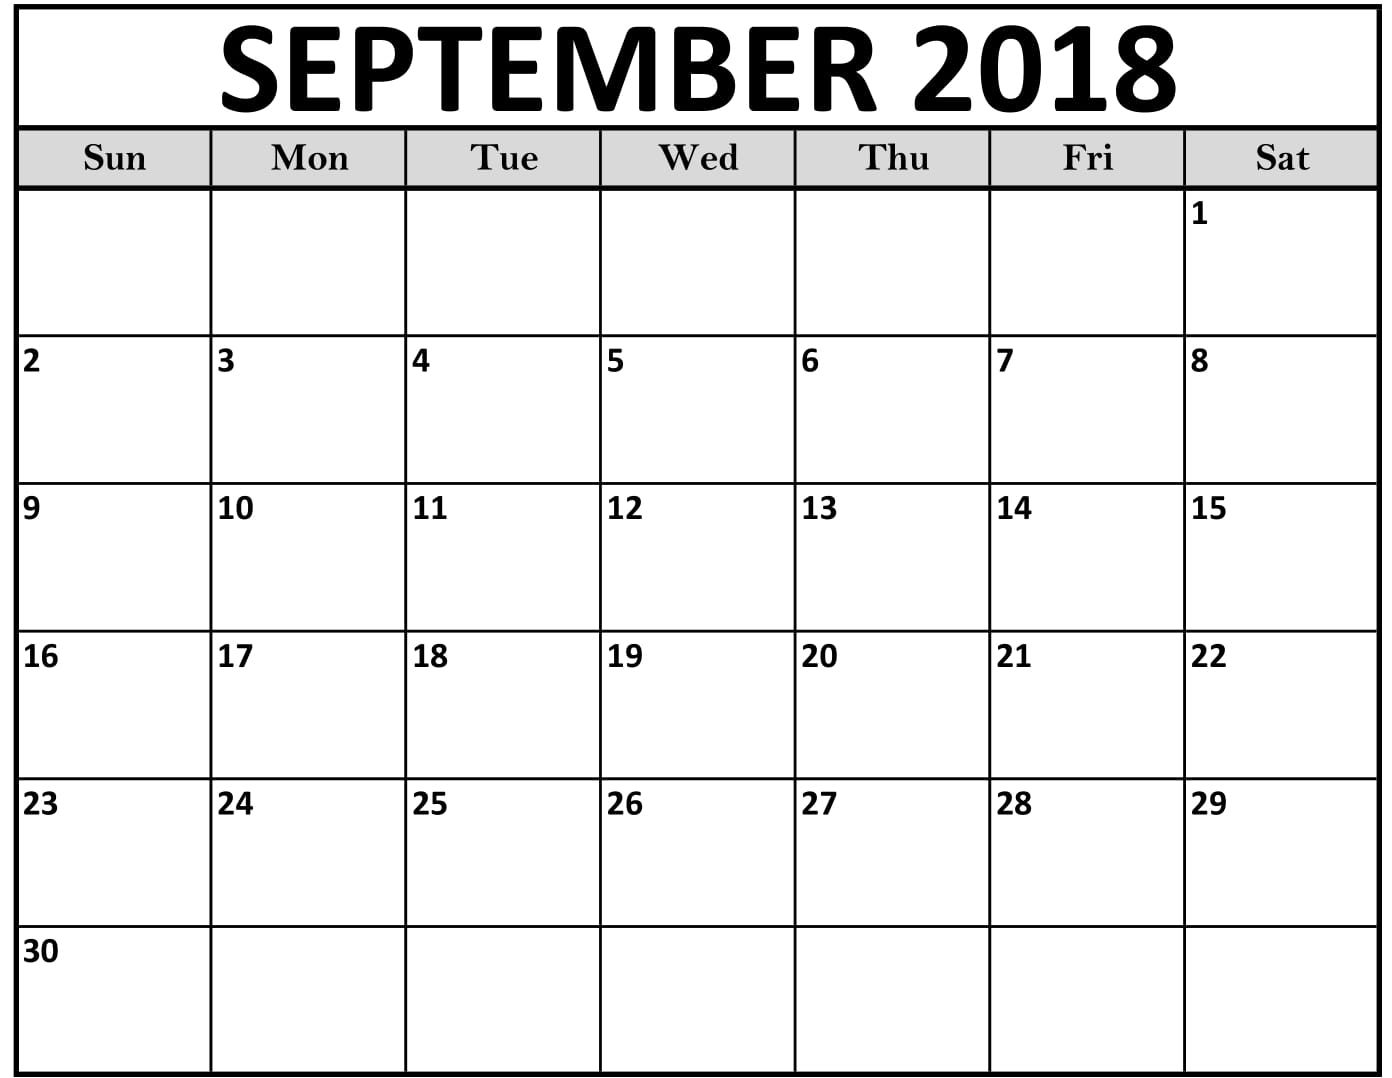 September Calendar Printables : September calendar free download